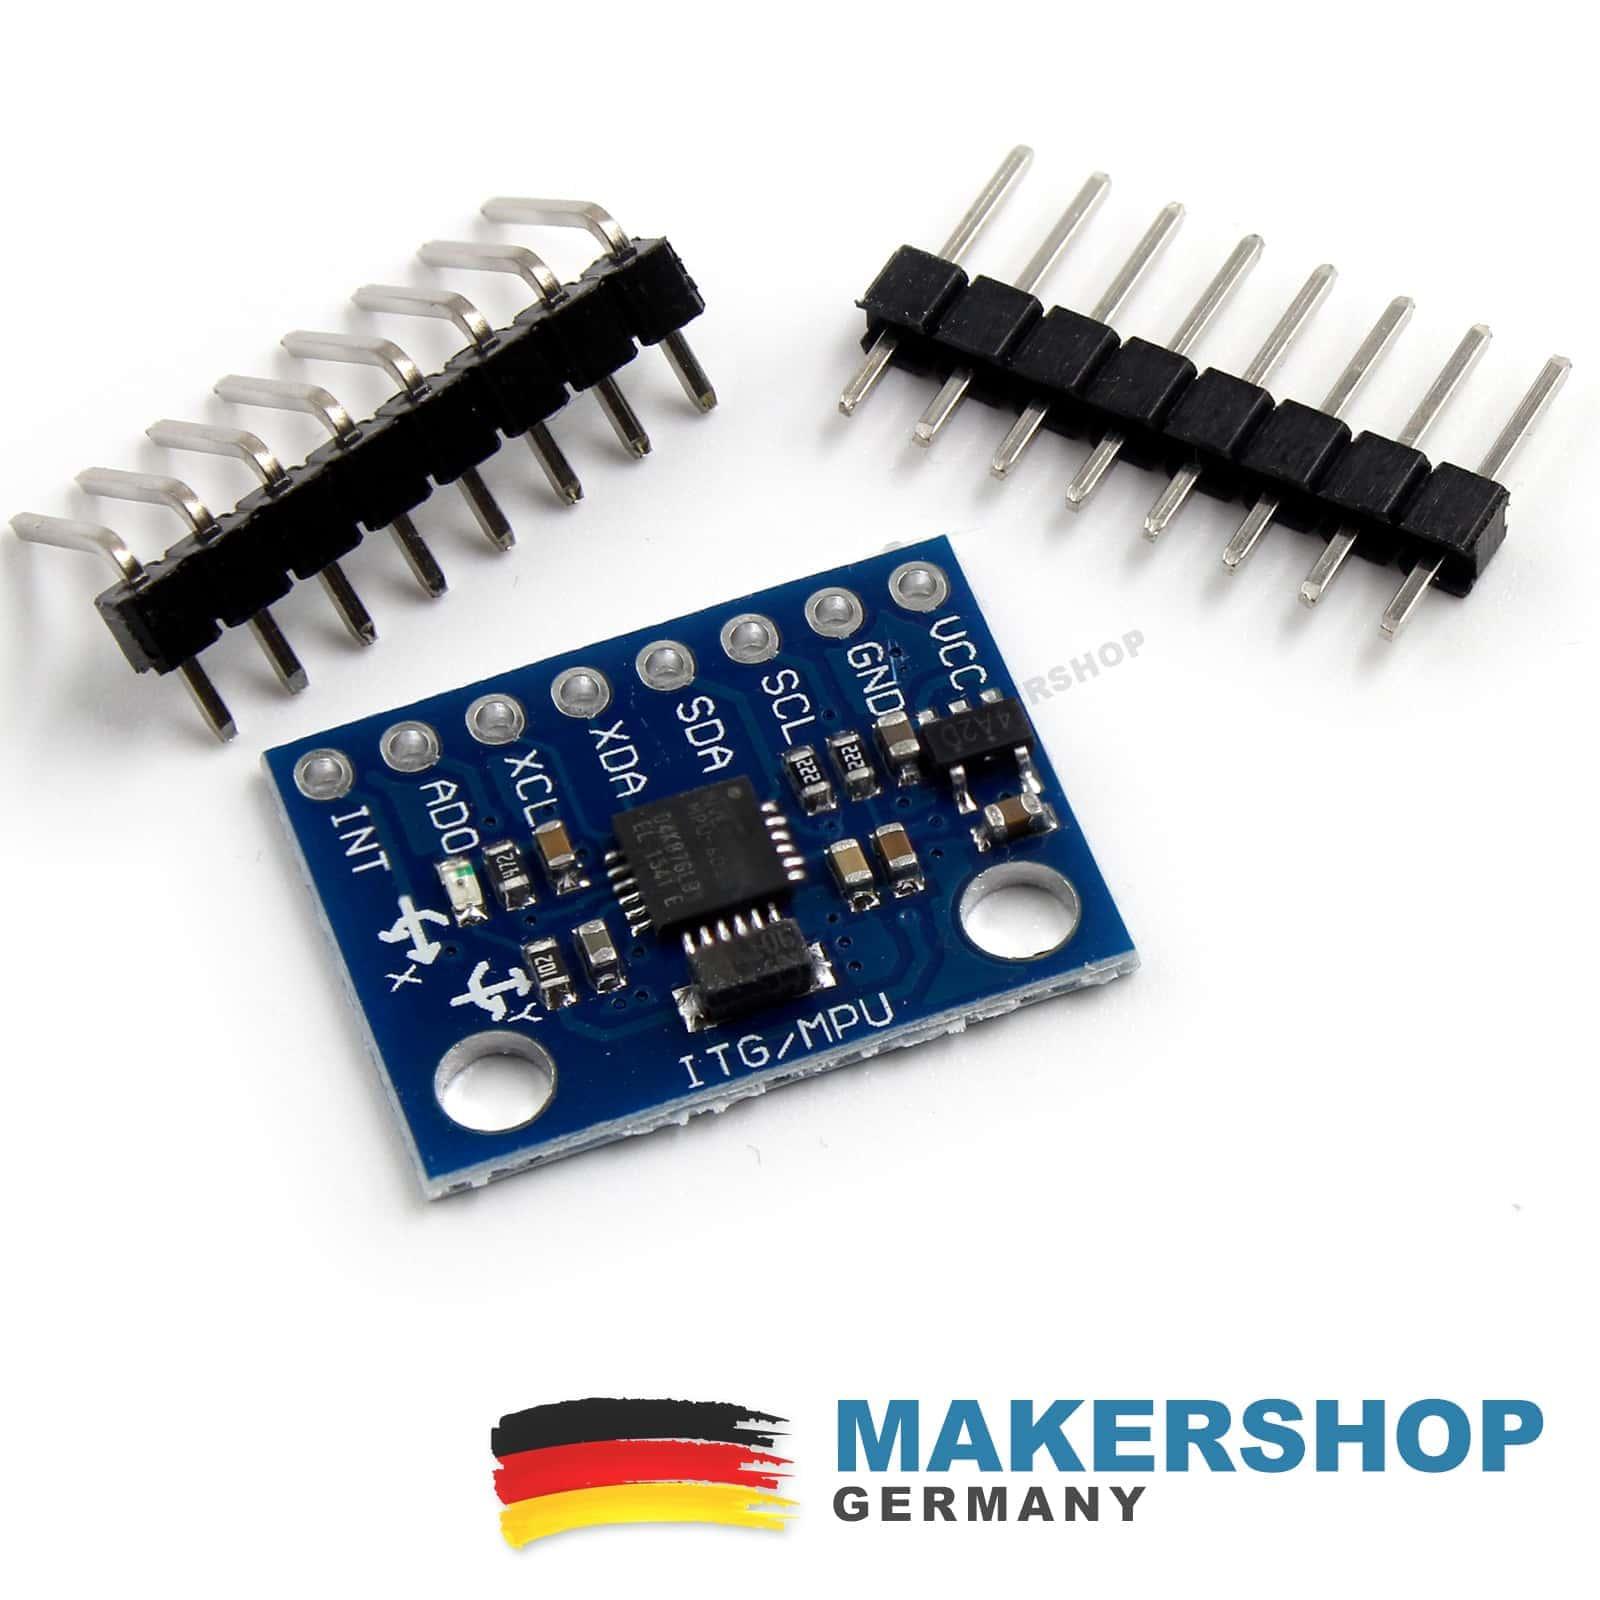 2x GY-521 3-Achsen Gyroskop Sensor Beschleunigungssensor Arduino gy521 Pi MPU...